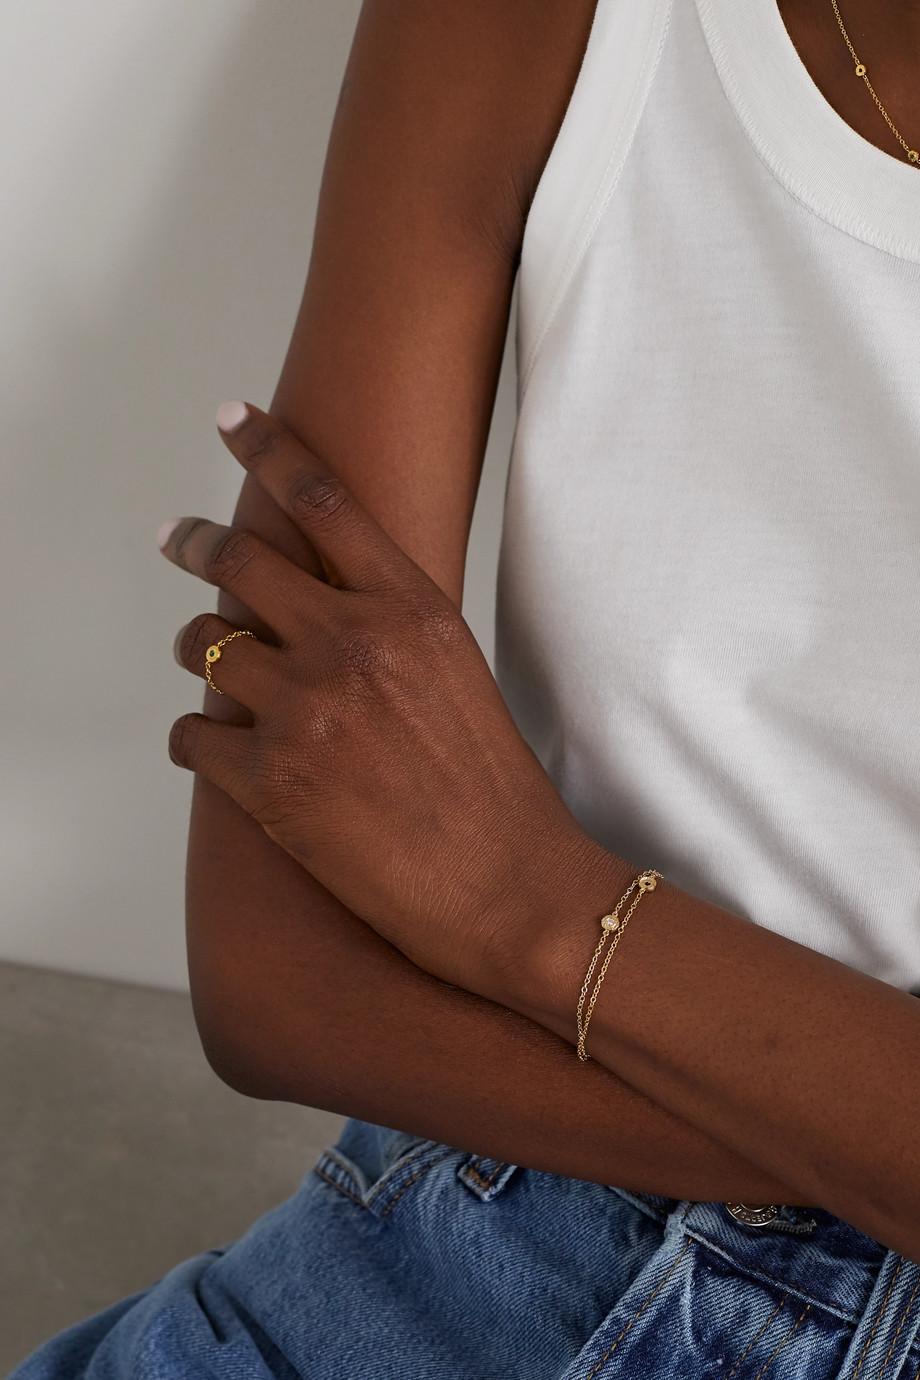 Octavia Elizabeth + NET SUSTAIN Nesting Gem Armband aus recyceltem 18 Karat Gold mit Diamant